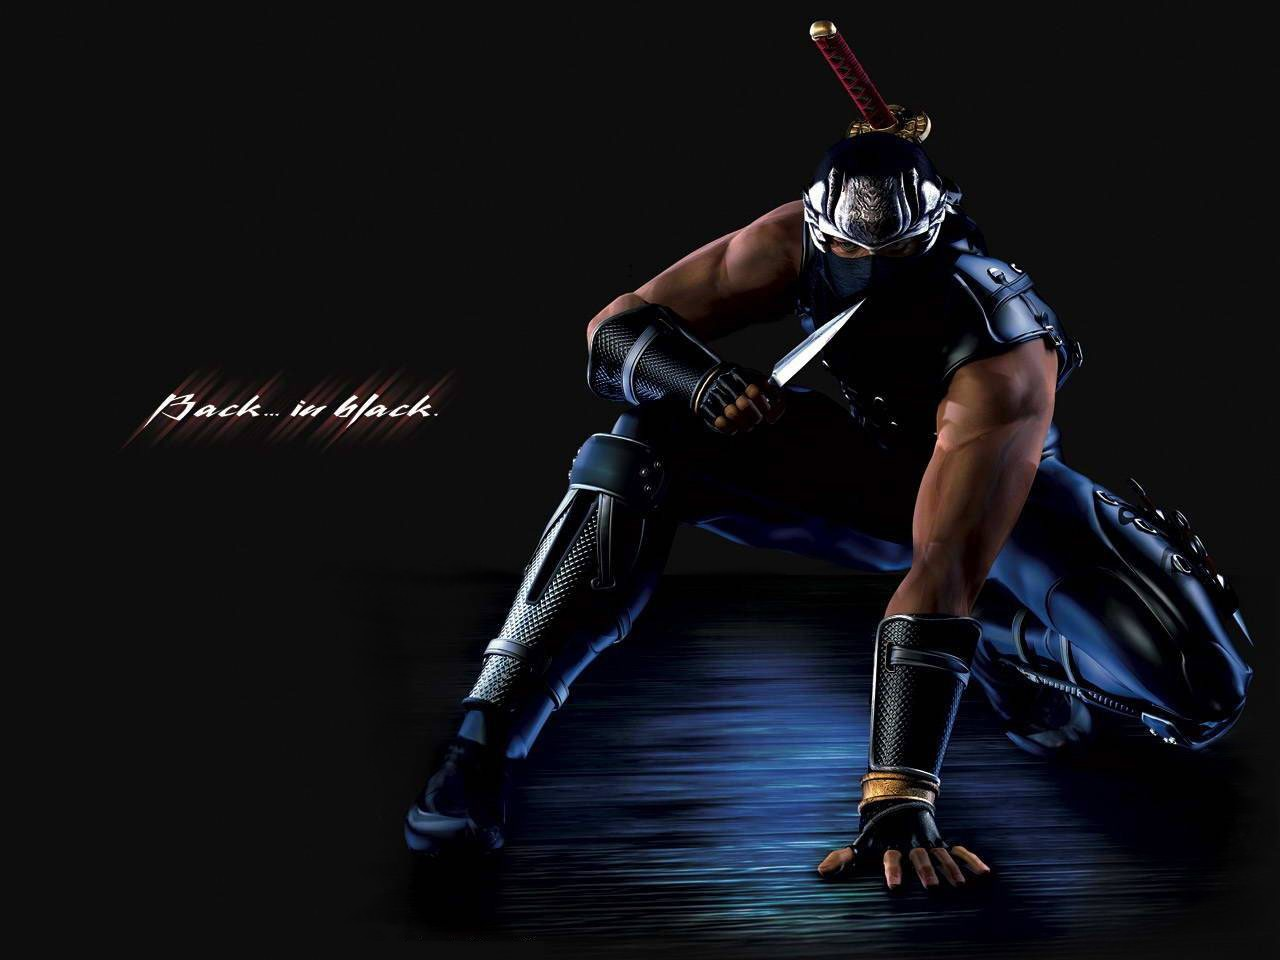 Black ninja wallpapers Funny Amazing Images